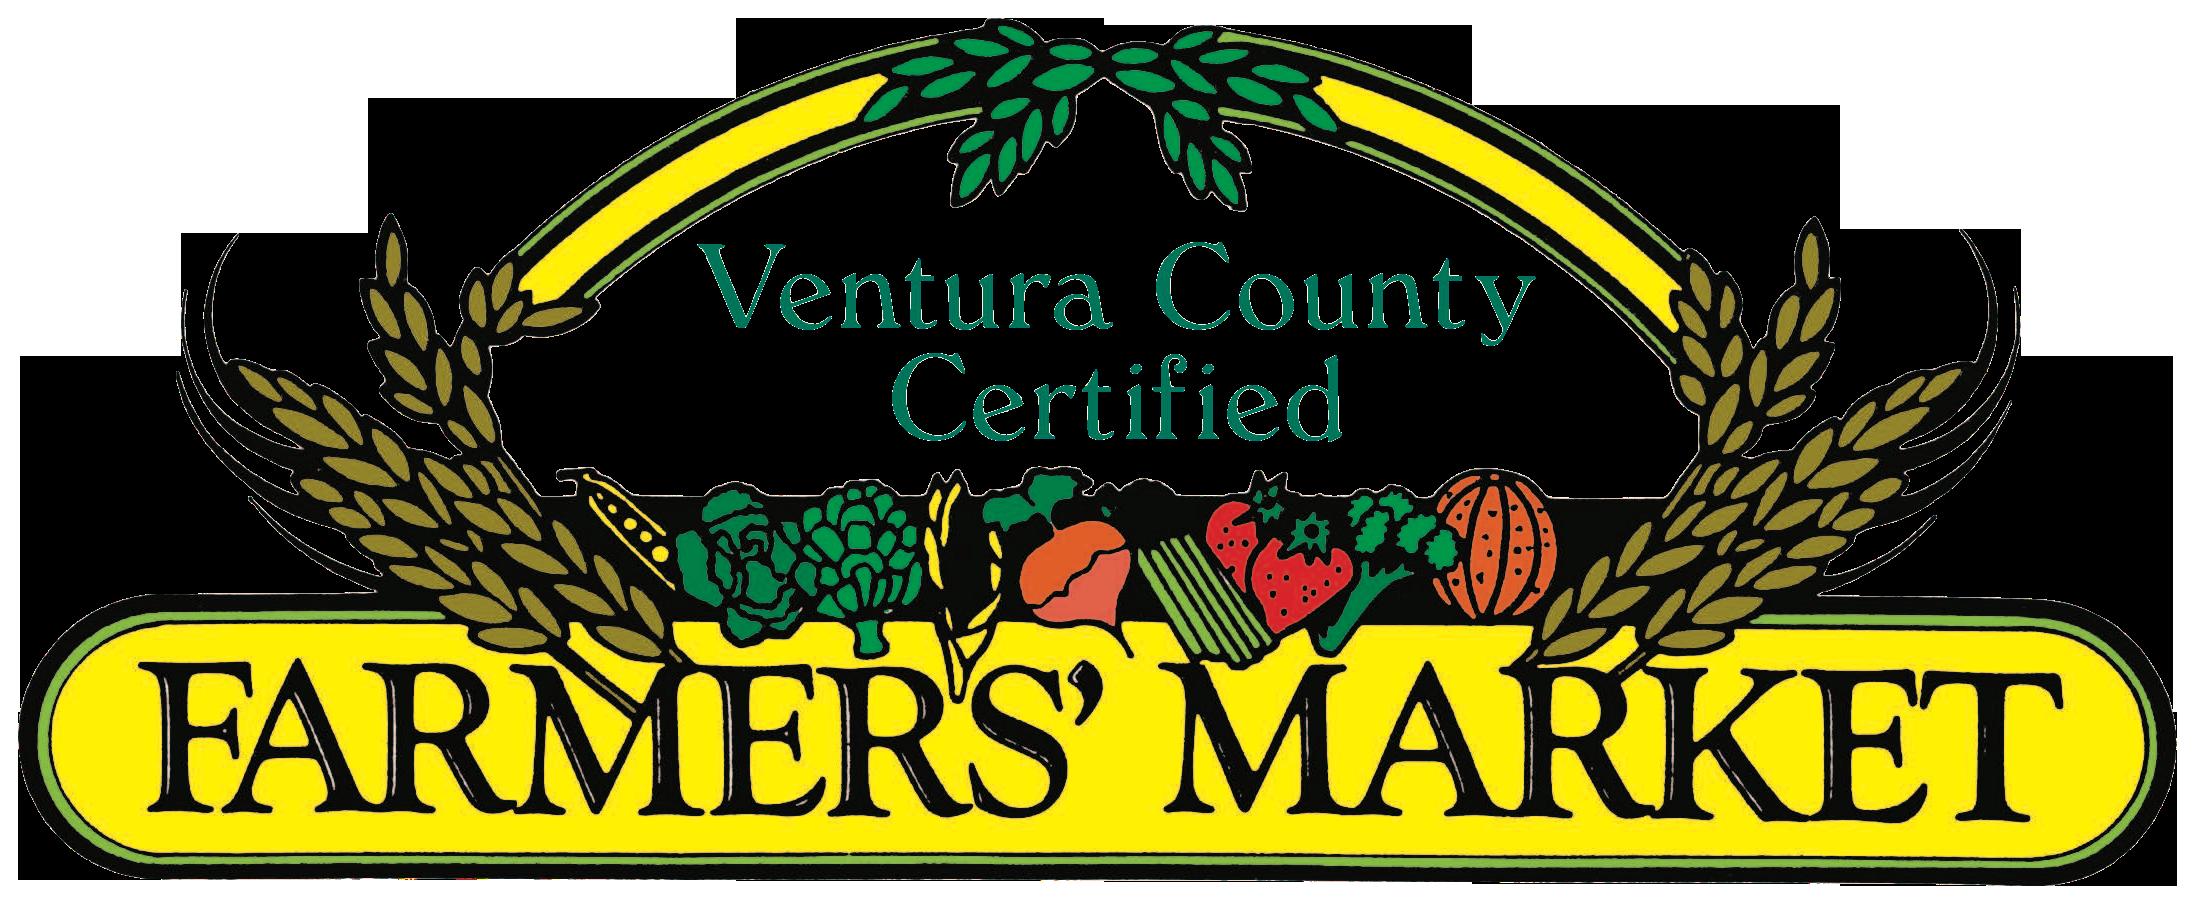 Farmers-Market-Transp-Logo-Color_Ventura-County-09-27-19.png